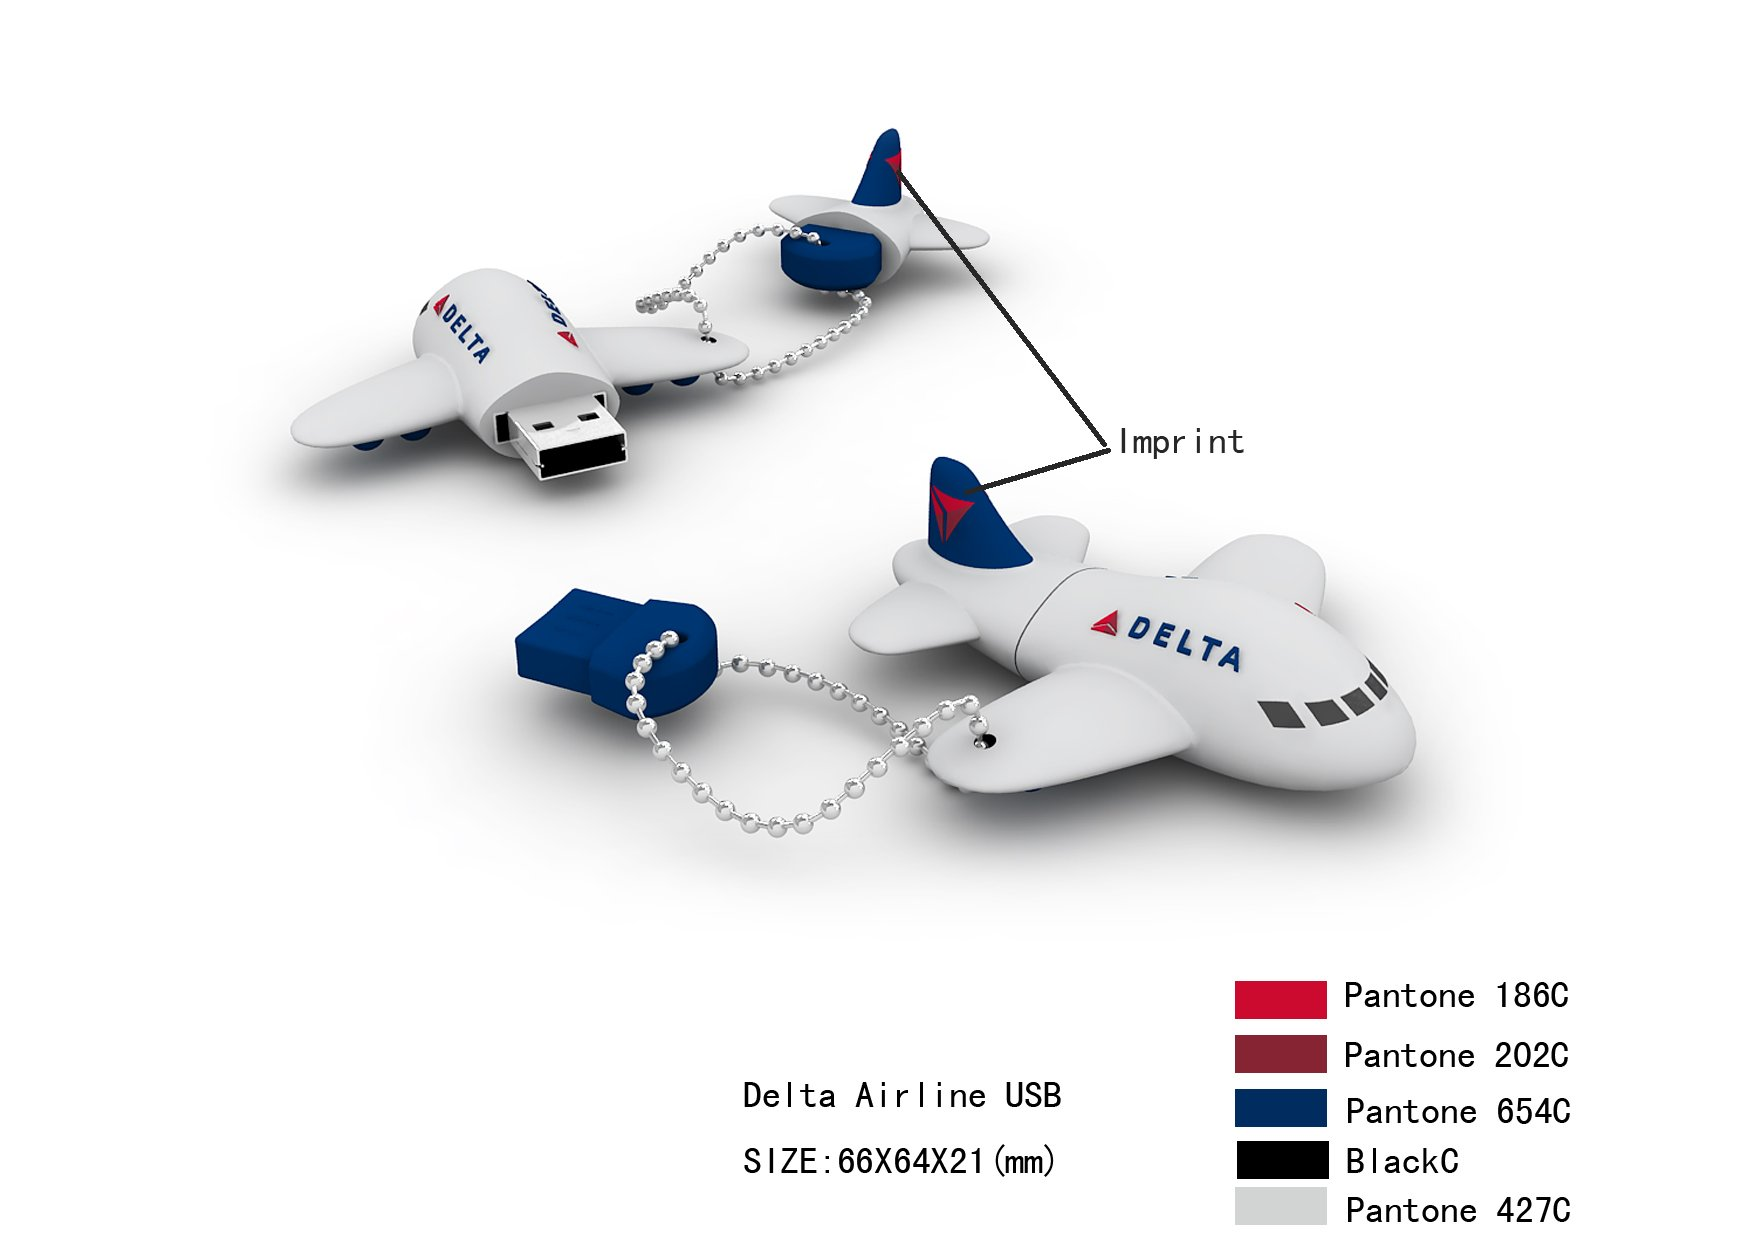 דיסק און קי במראה מטוס  PLANE USB DISK